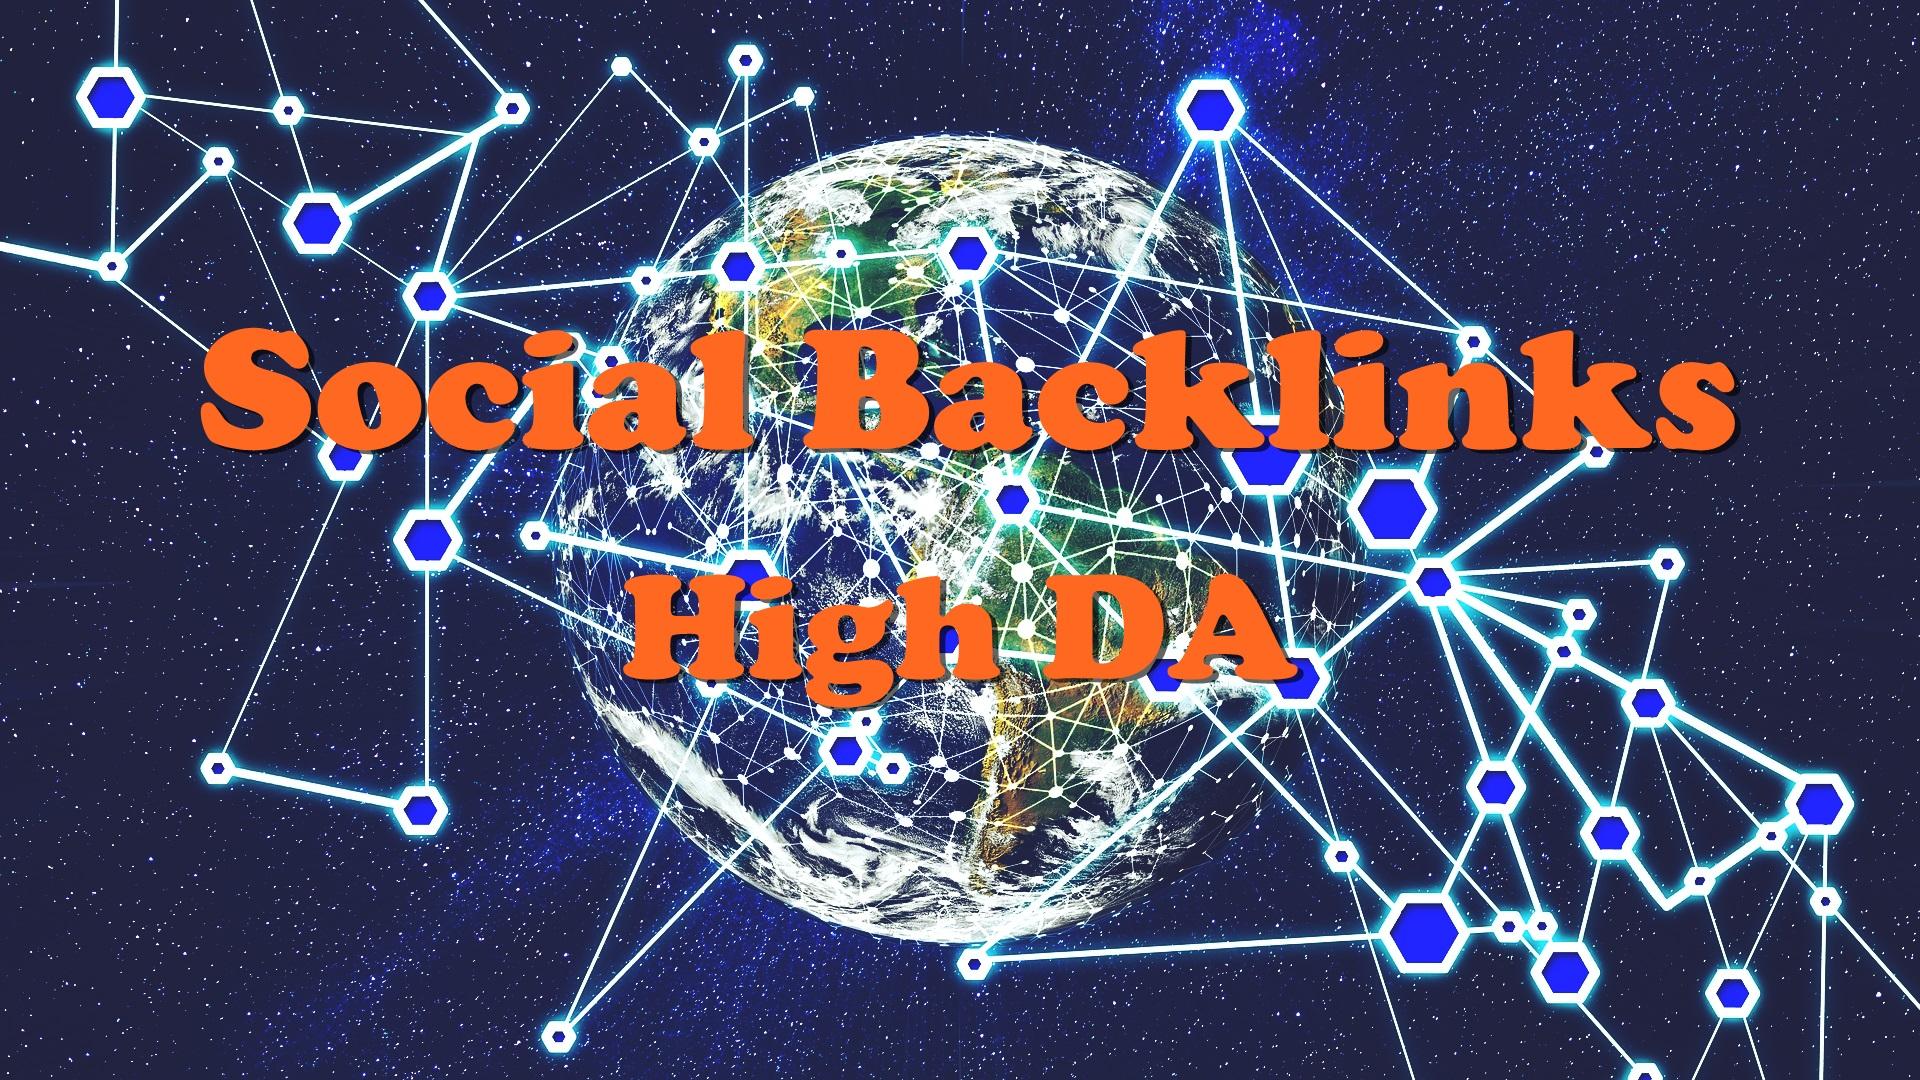 Manual 30 Social Backlinks High DA and Dofollow